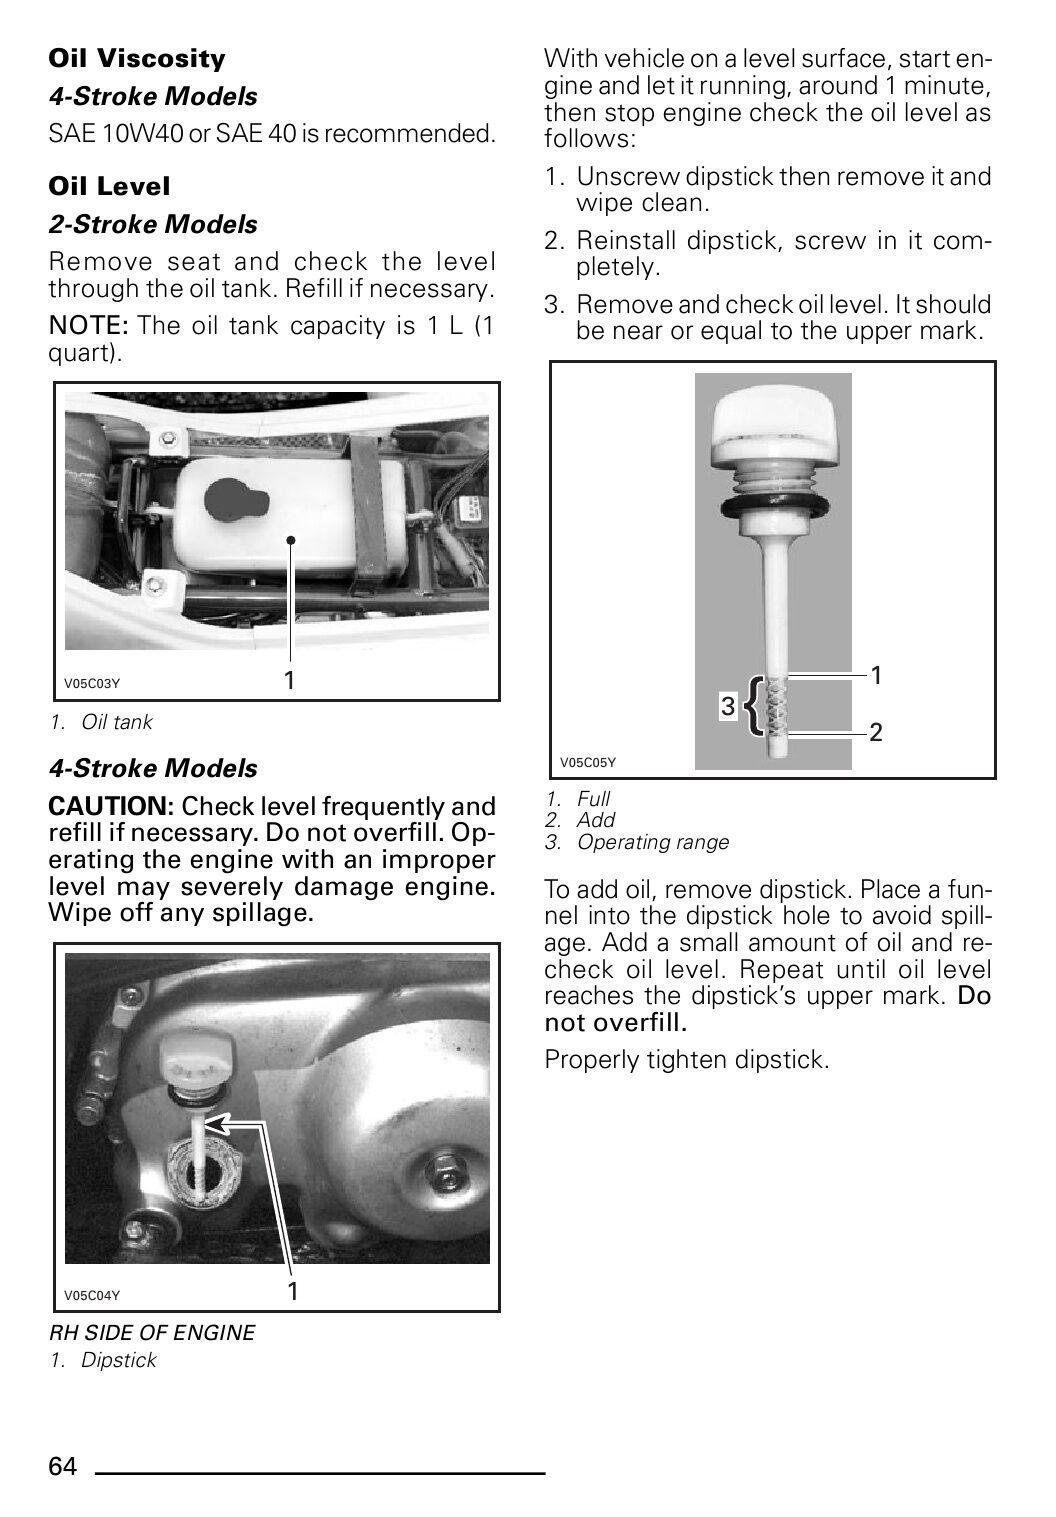 Repair manual bombardier ds 90 2015 ebook array bombardier ds 90 manual ebook rh bombardier ds 90 manual ebook argodata us fandeluxe Image collections